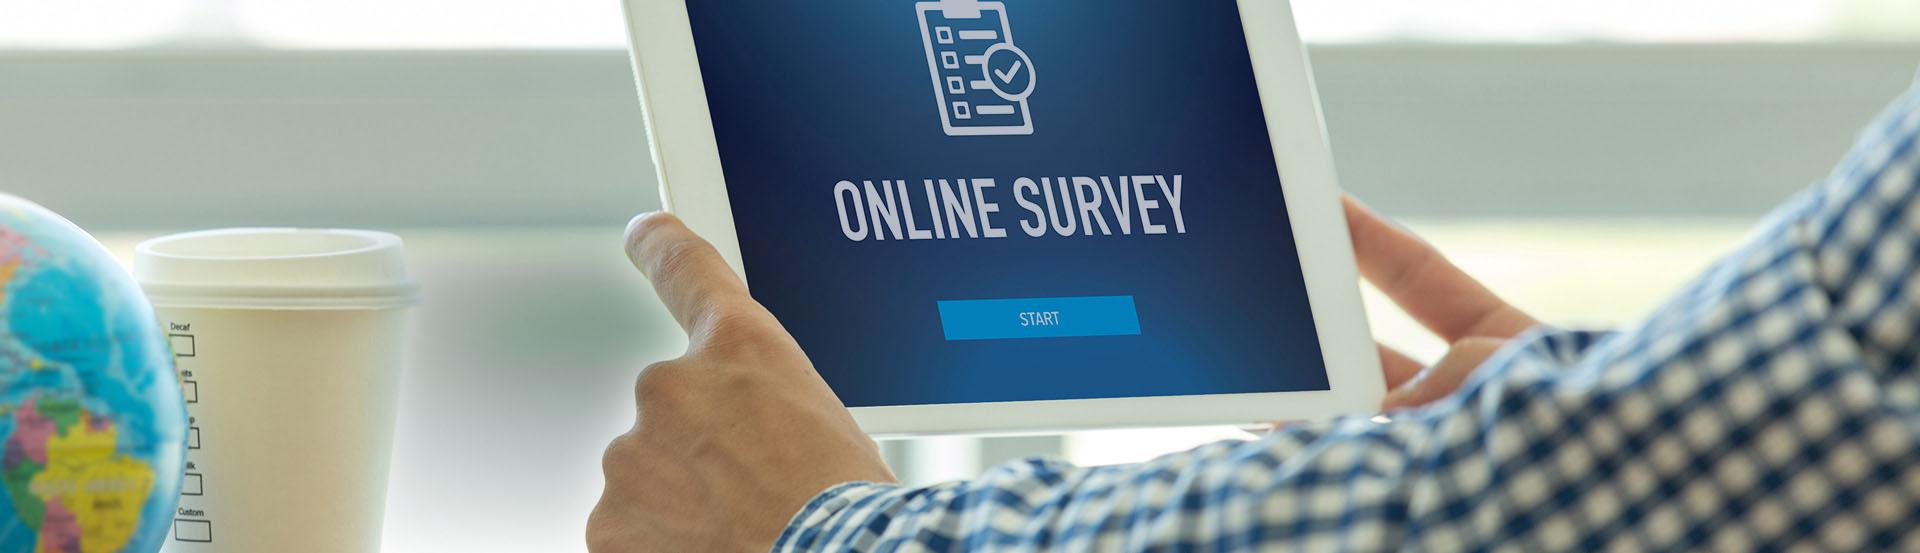 Guide for successful surveys